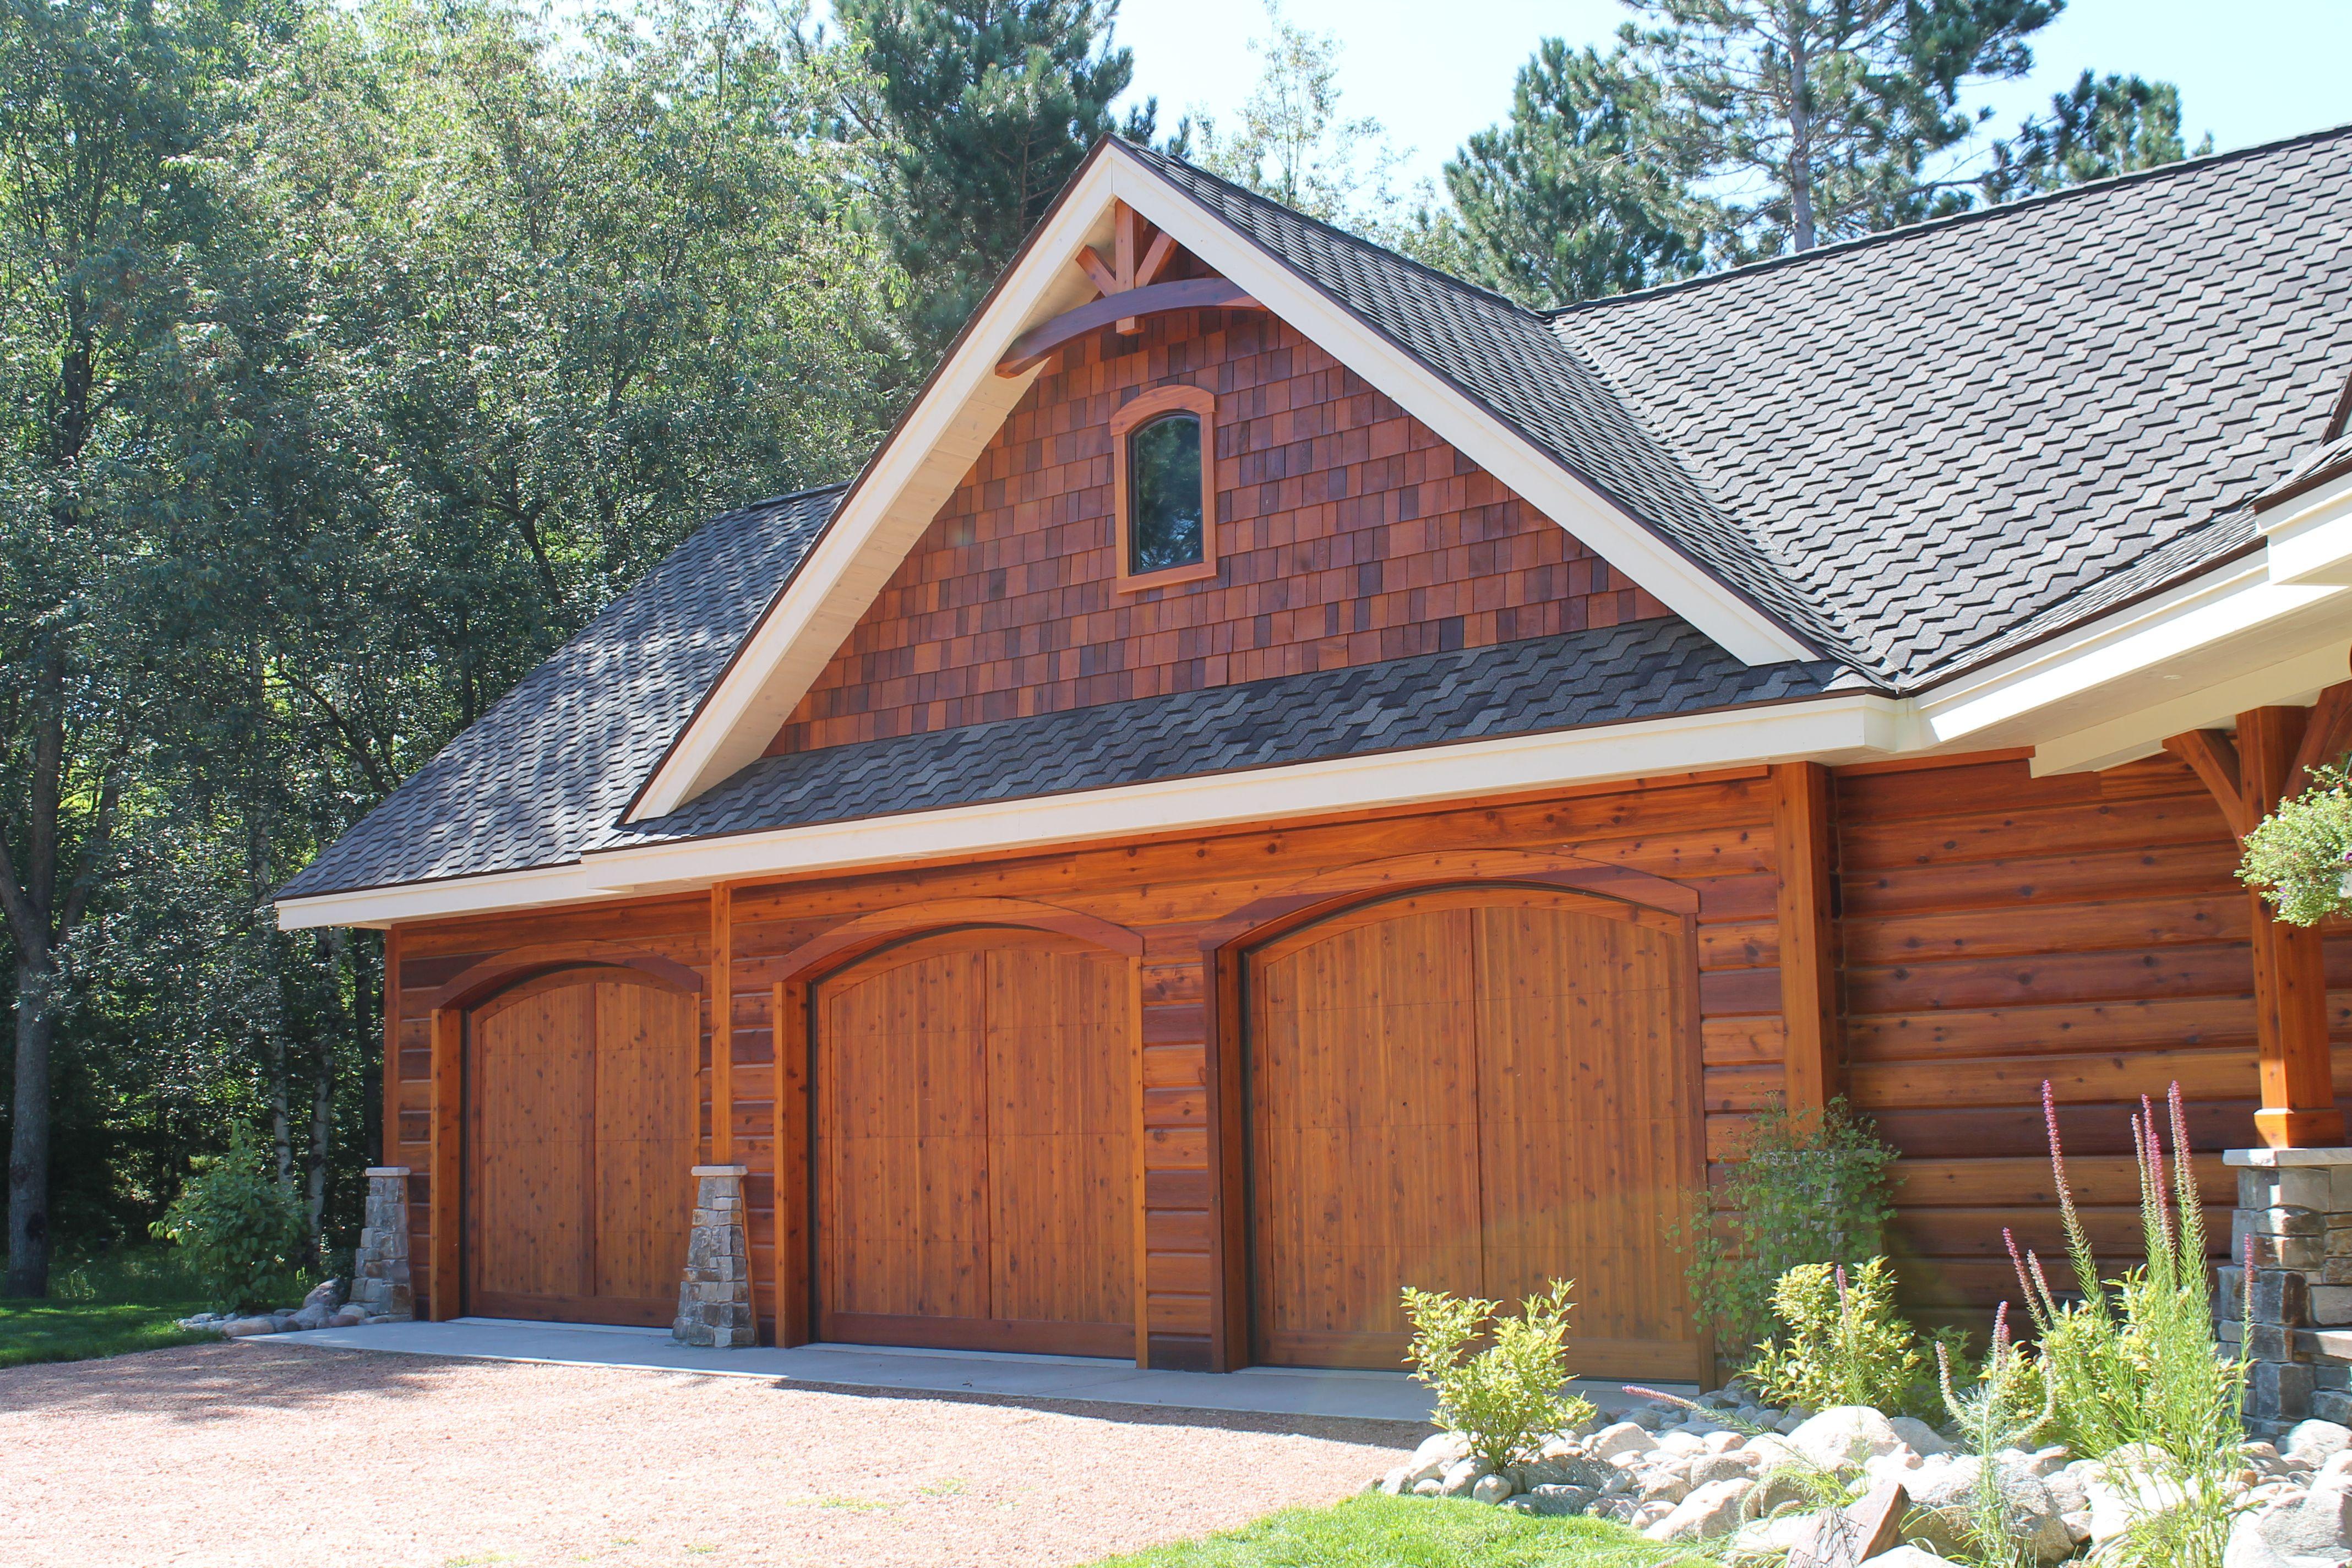 2 10 tight knot cedar scan log t g sikkens l s 005 natural - Best exterior stain for cedar siding ...